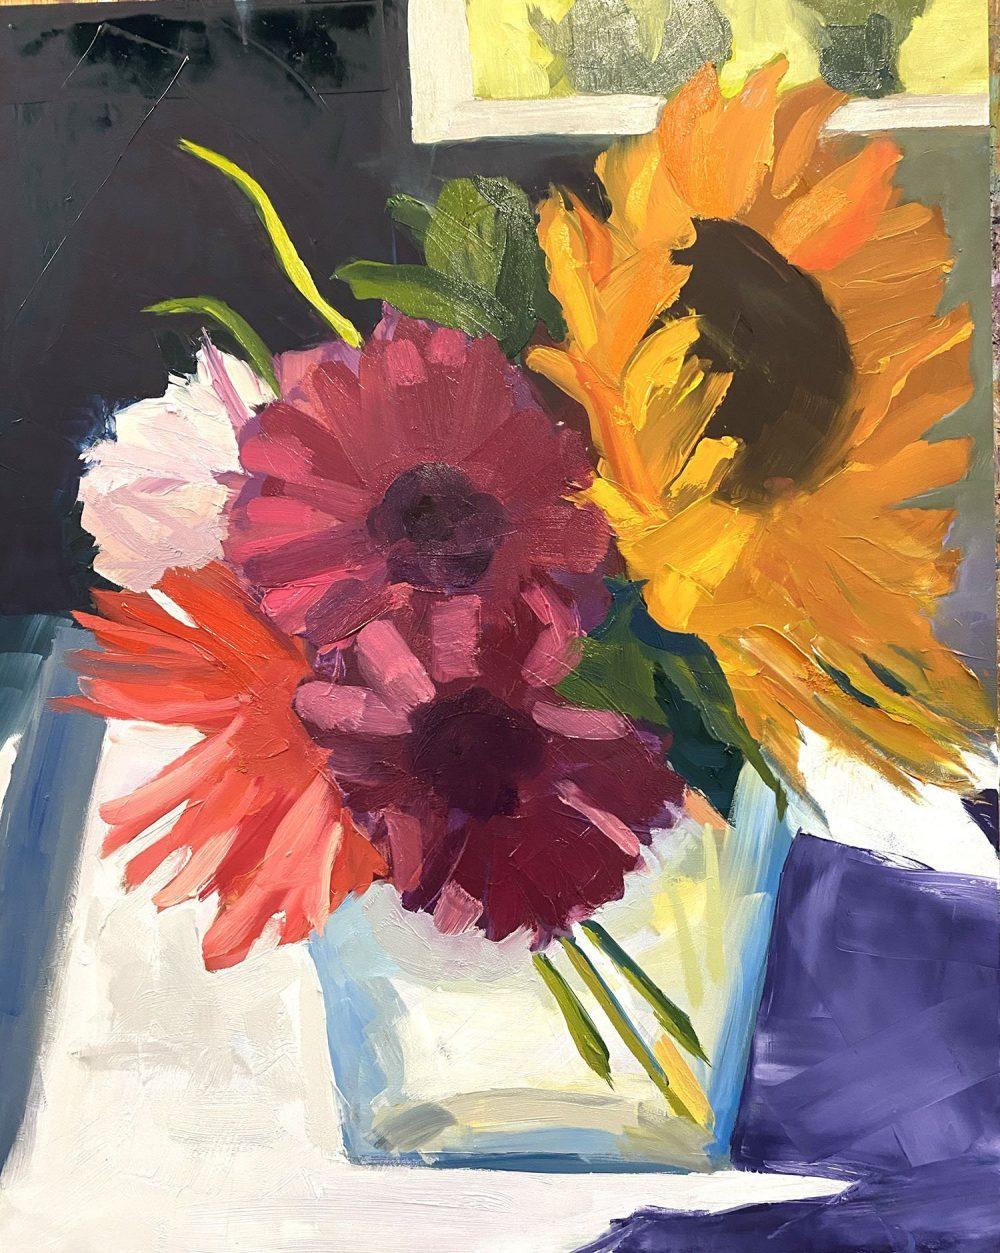 Mimi Jigarjian, Bouquet Boogie, at Waltham Open Studios 2020